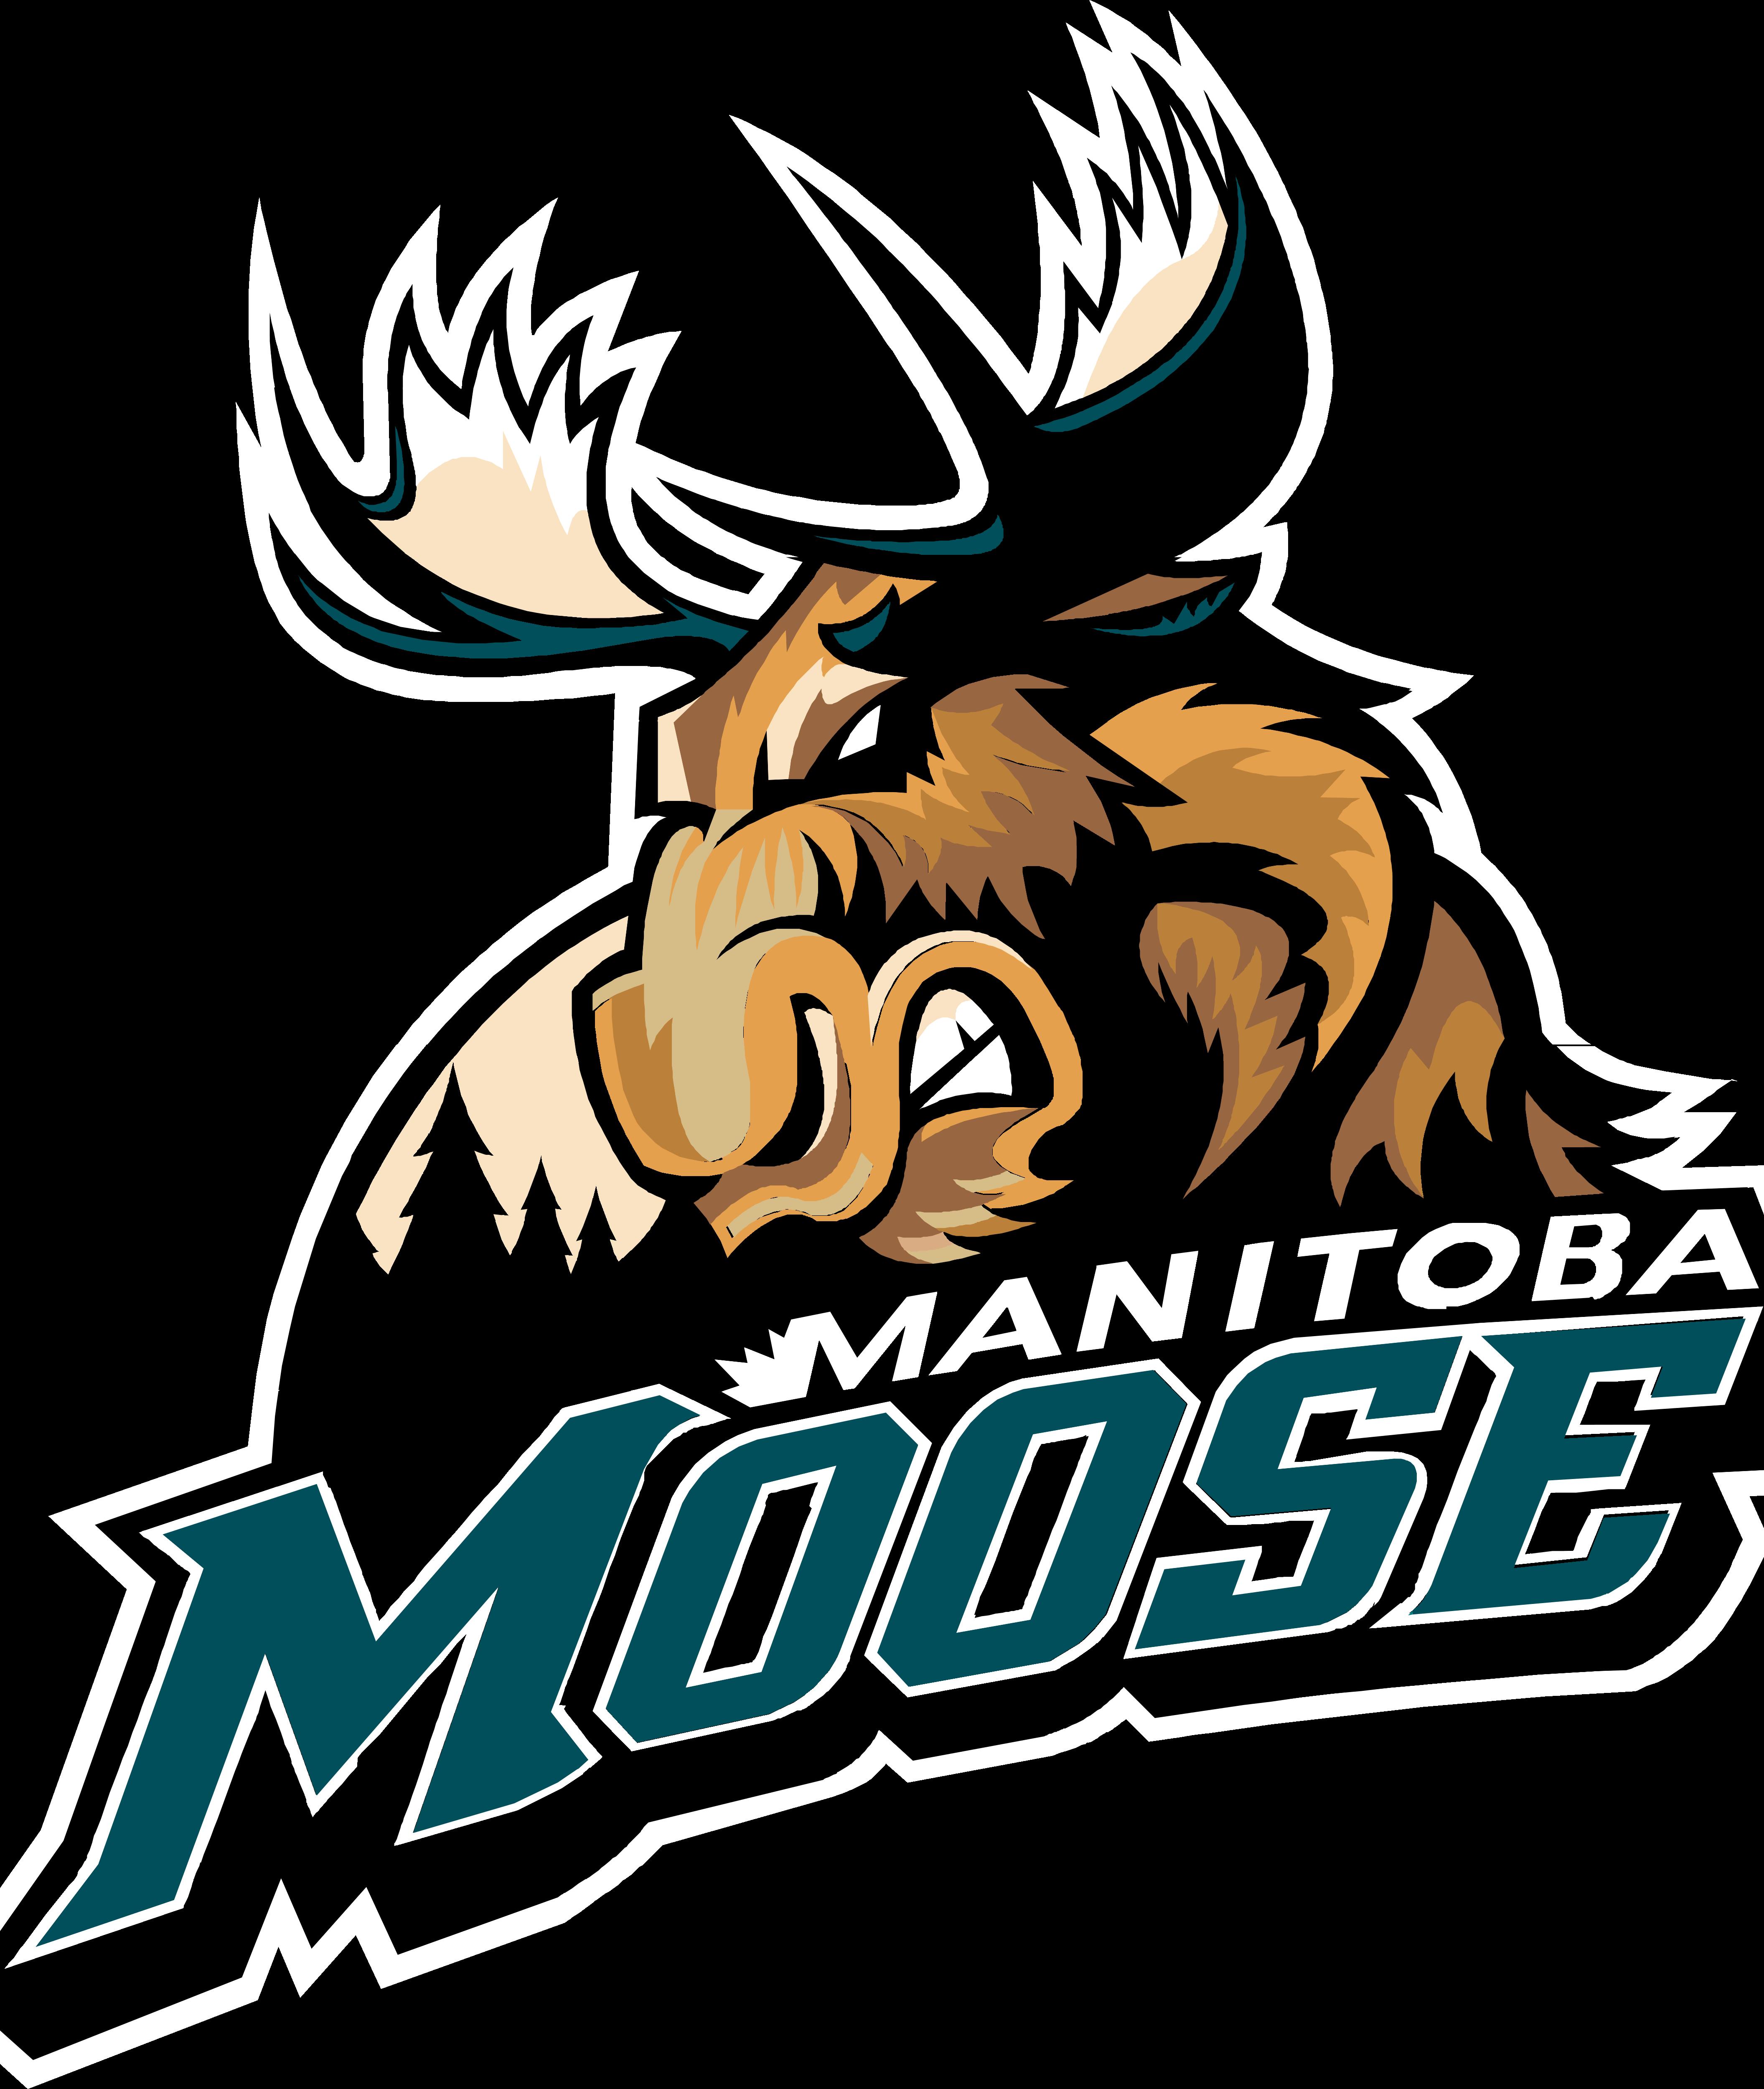 Manitoba logos download . Moose clipart kid